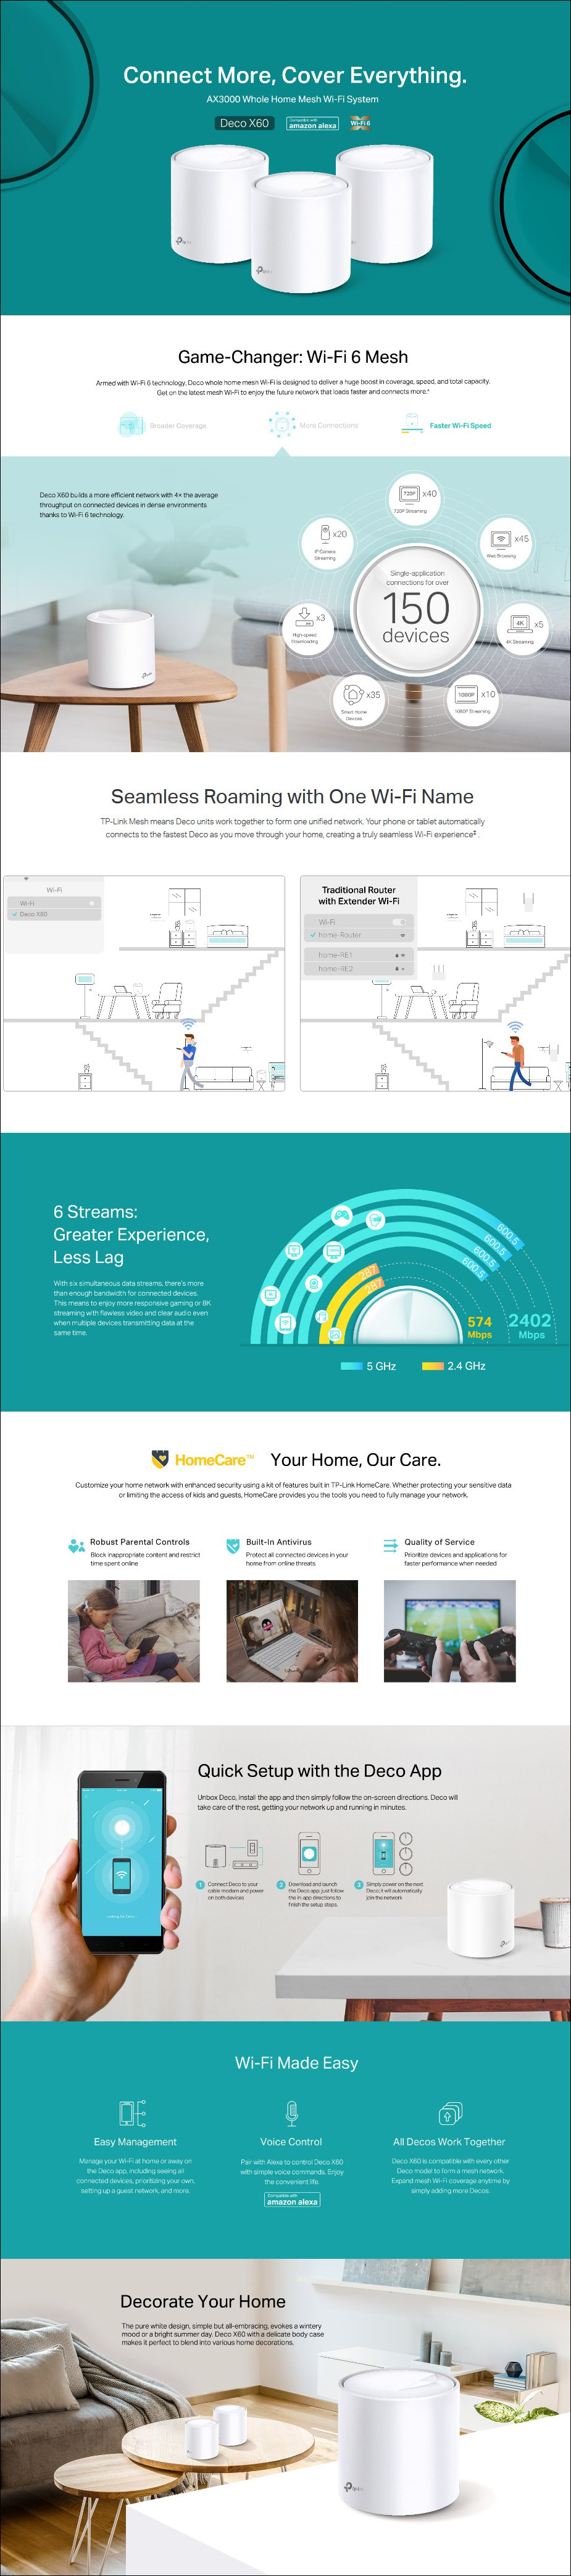 tplink-deco-x60-ax3000-whole-home-mesh-wifi-system-3pack-ac31230-2.jpg